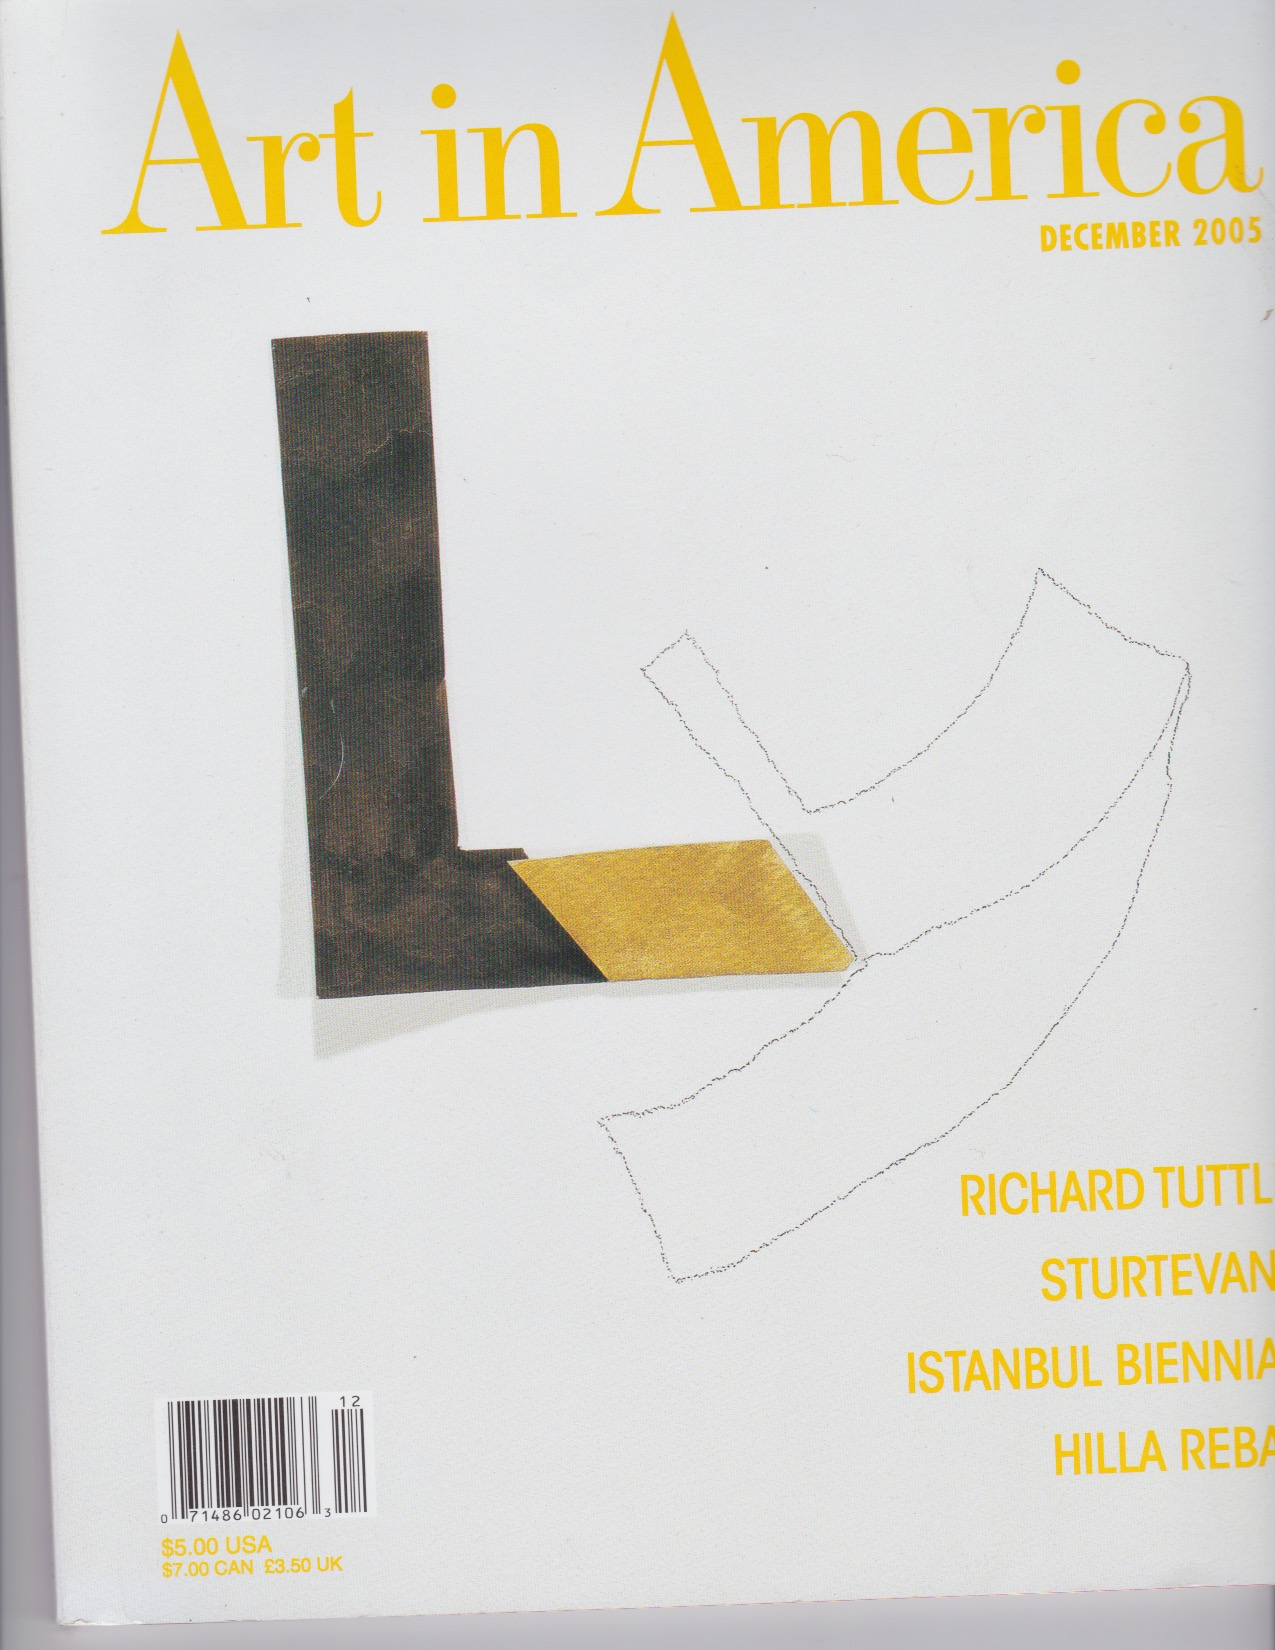 Art in America cover.jpeg